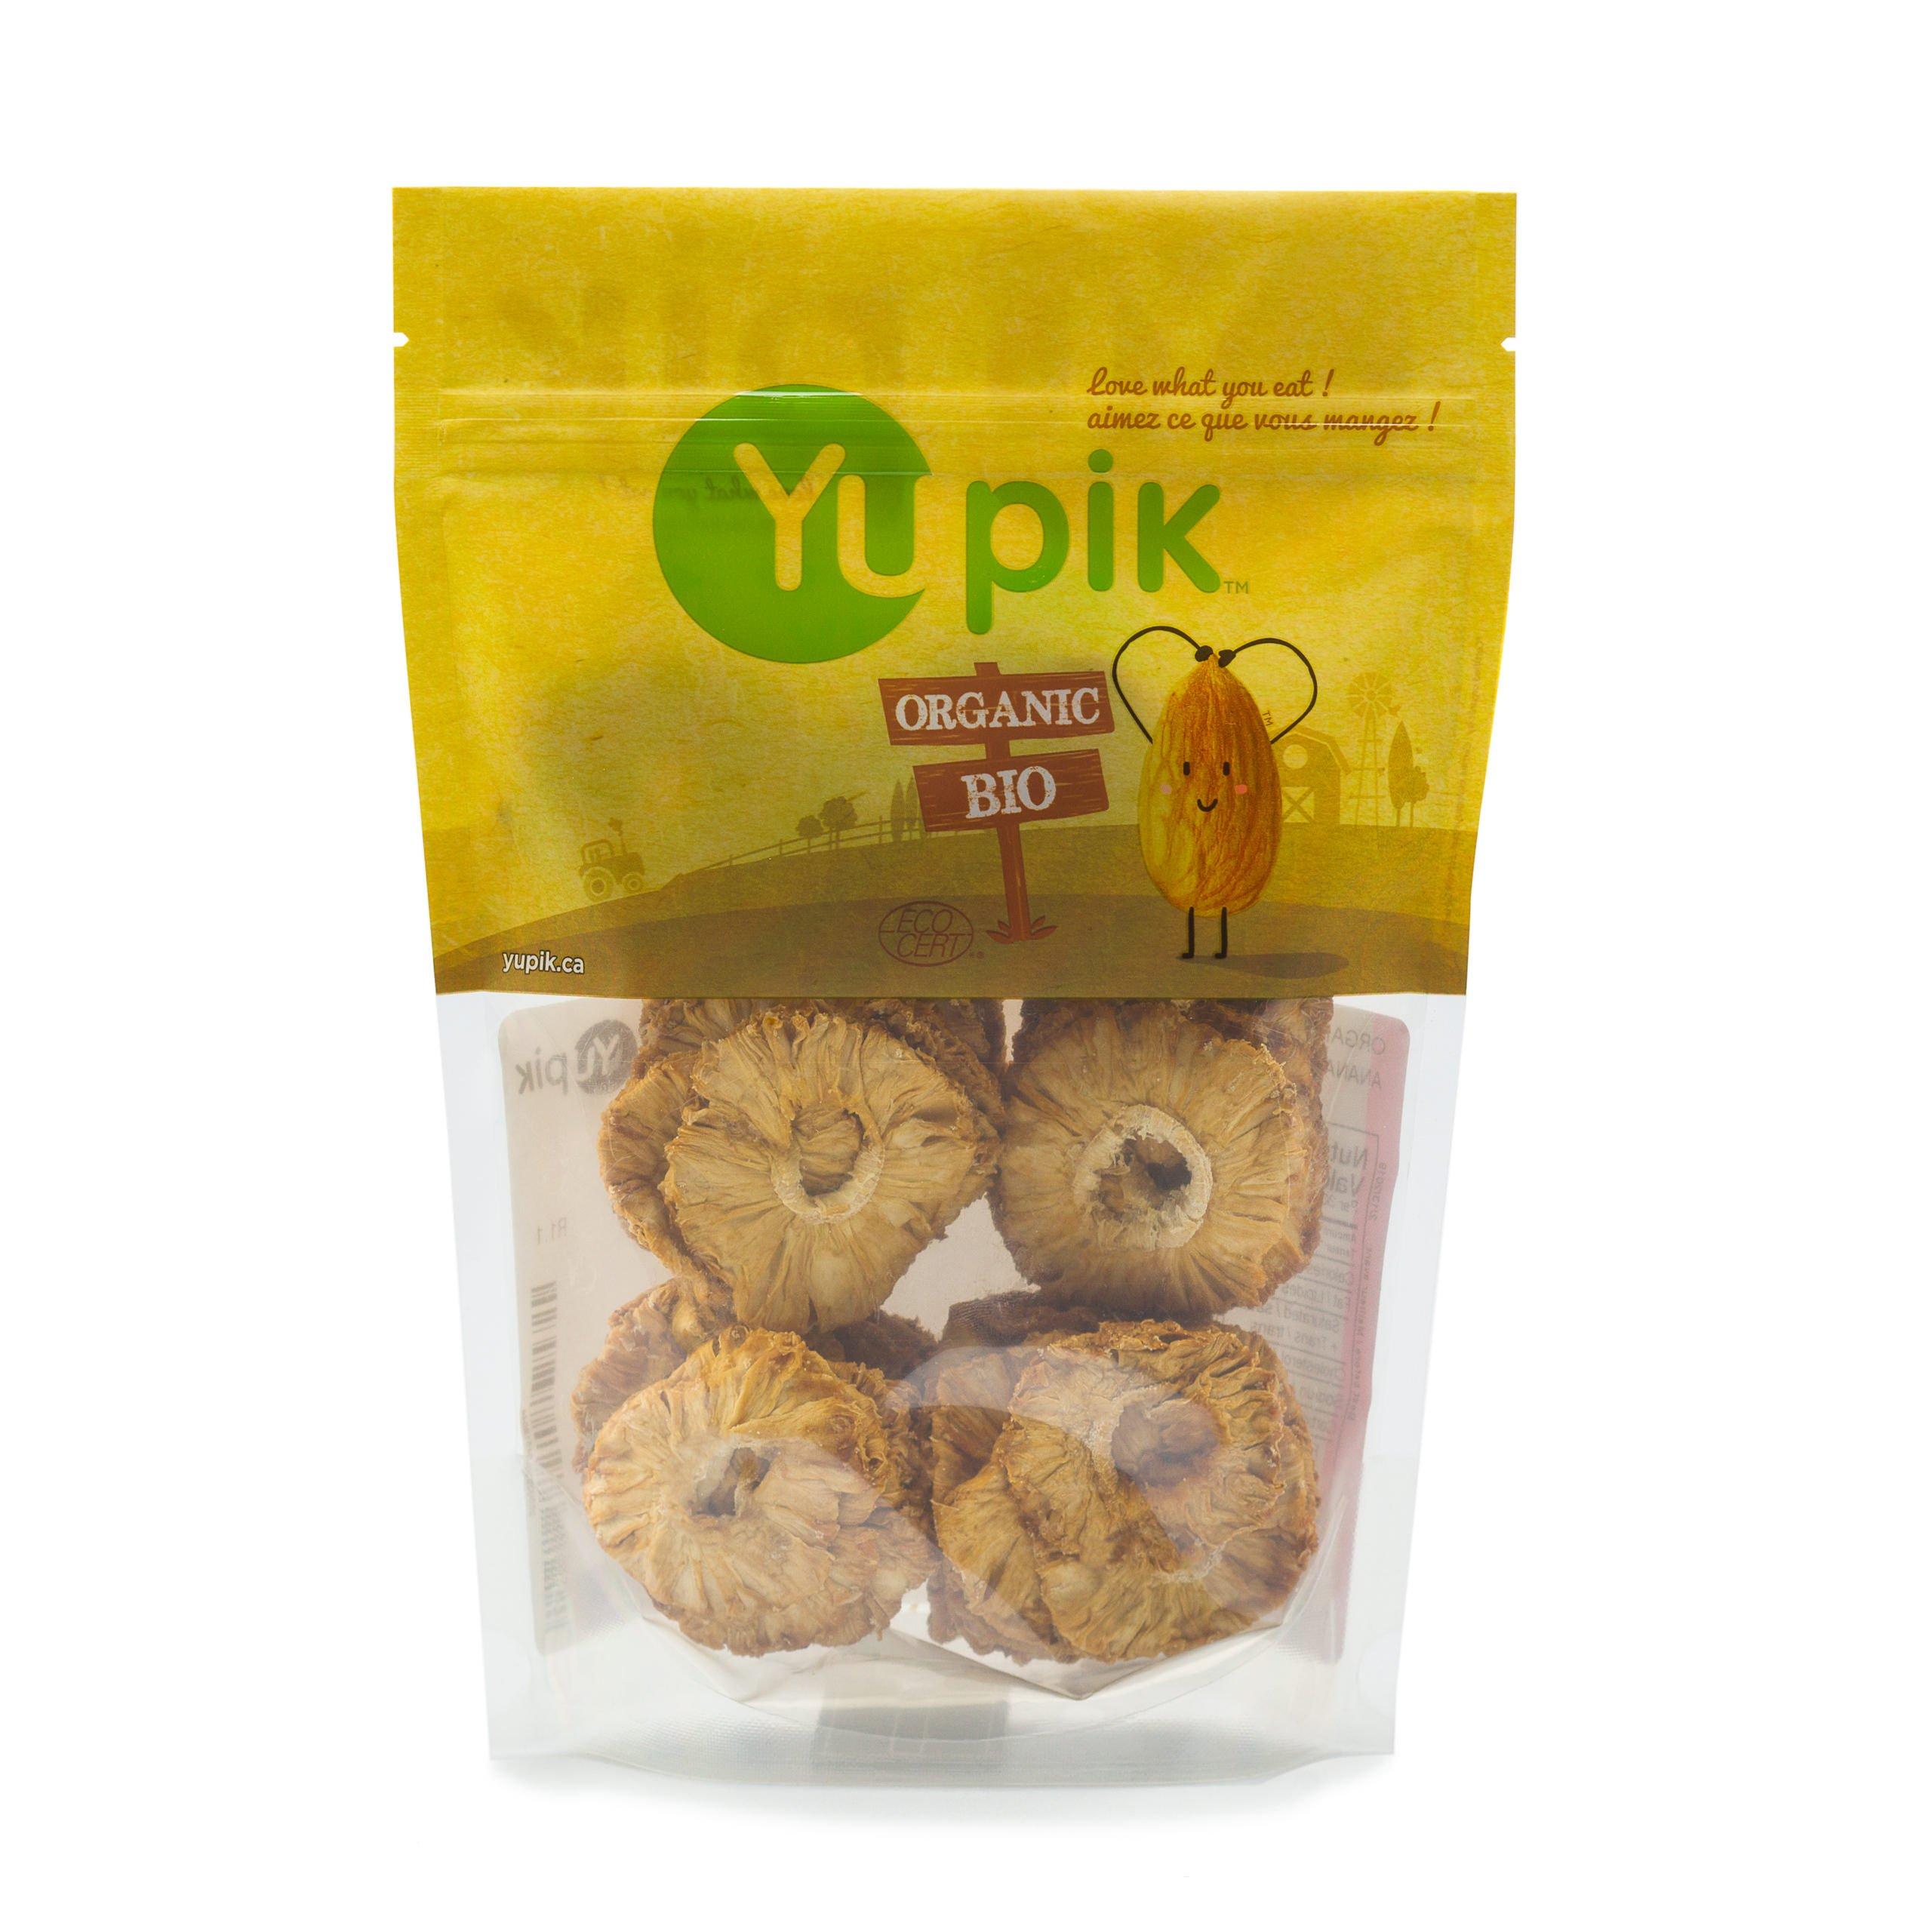 Yupik Organic Dried Pineapple Rings, 1 Lb by Yupik